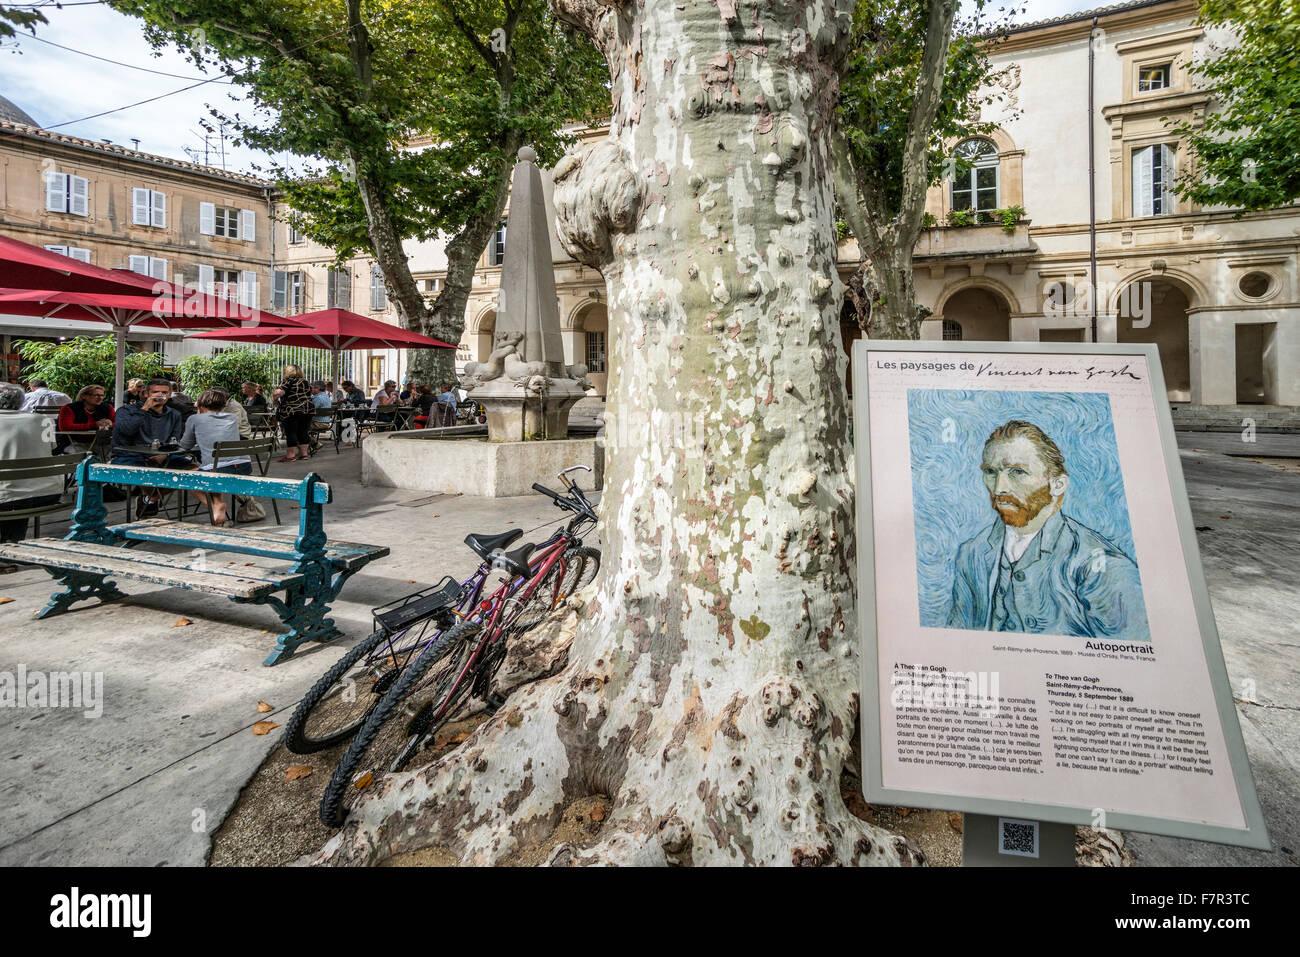 Van Gogh Info Sign, Plane Tree, village sqaure, Saint Remy de Provence, Provence, France - Stock Image